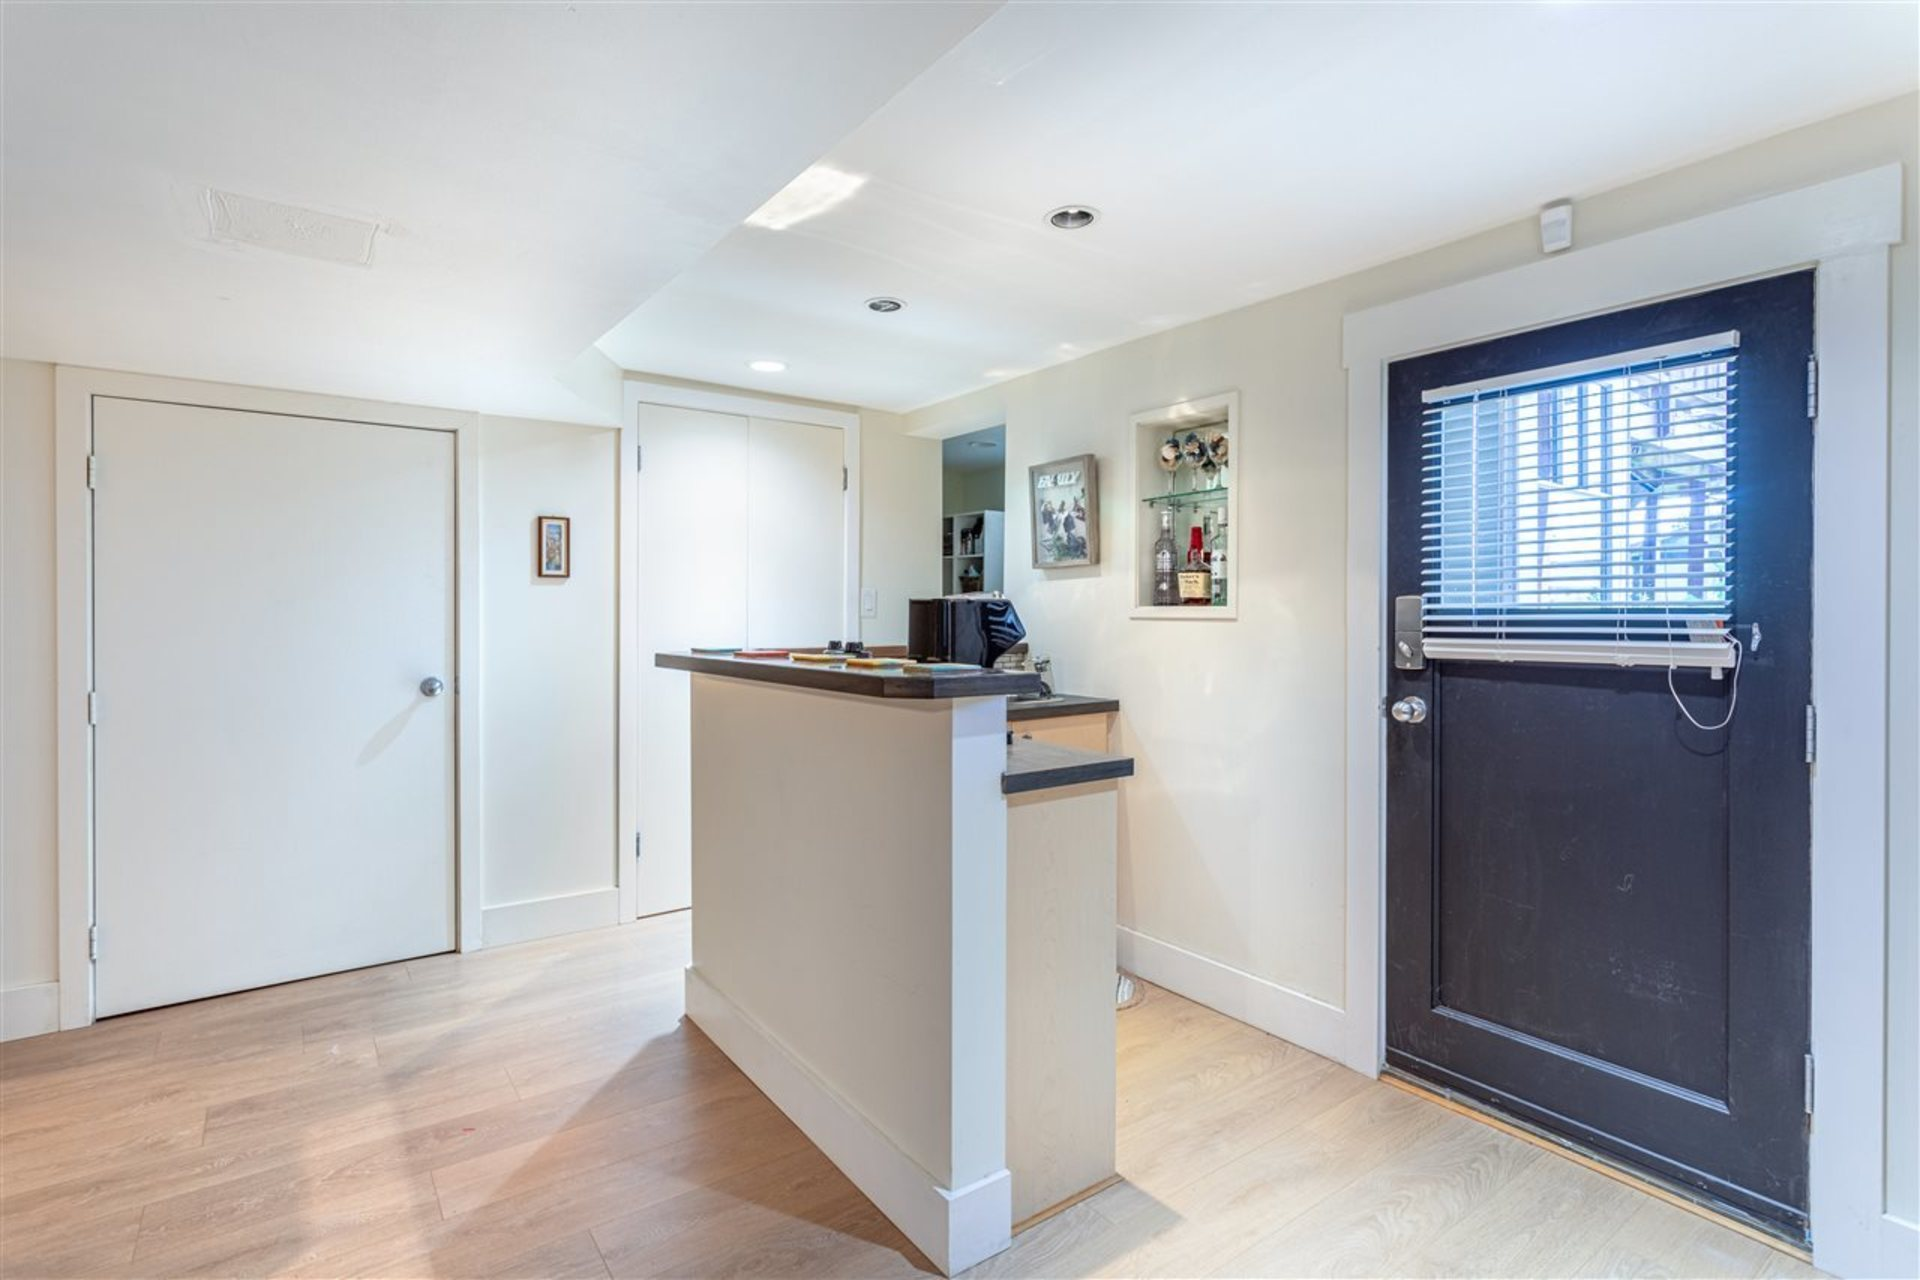 3912-parker-street-willingdon-heights-burnaby-north-18 at 3912 Parker Street, Willingdon Heights, Burnaby North